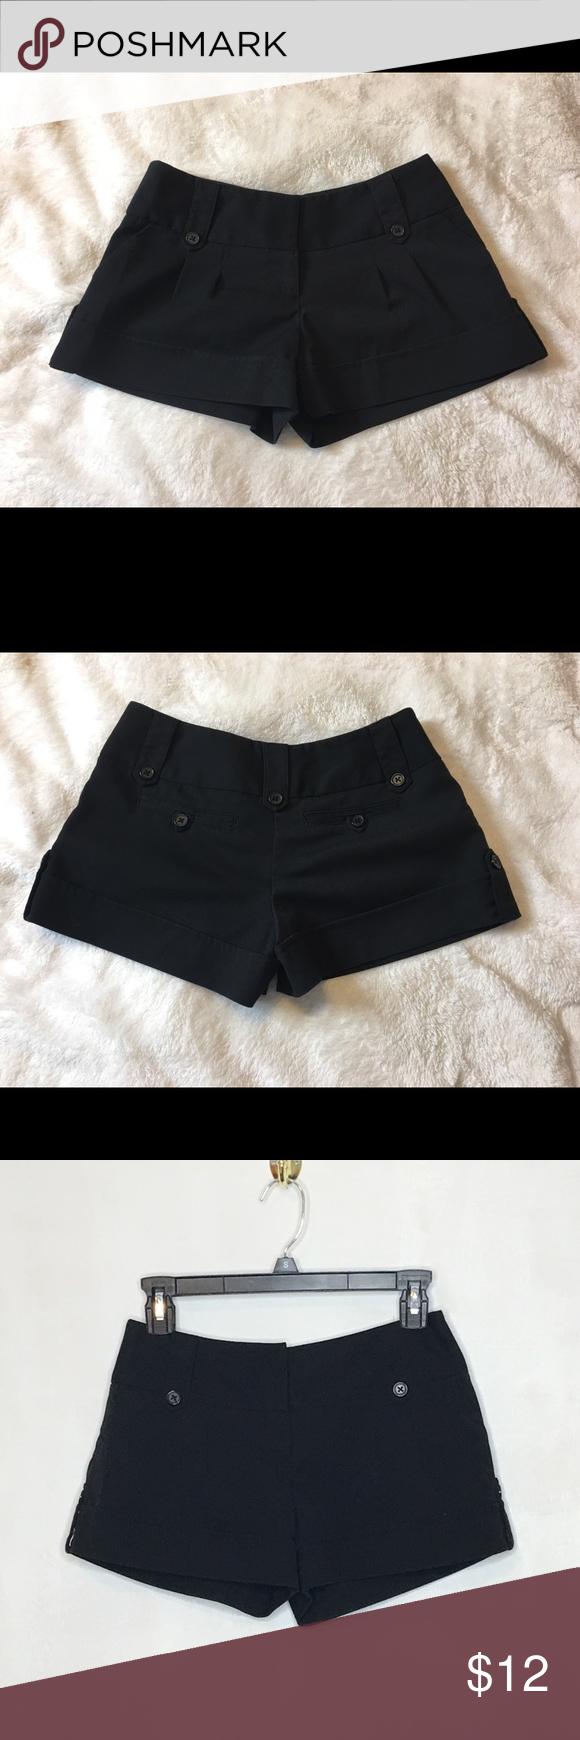 Tracy Evans Limited Black Dress Shorts Size 1 Super Cute Tracy Evans Black Dress Shorts In Size 1 Button Detail O Black Short Dress Short Dresses Black Dress [ 1740 x 580 Pixel ]